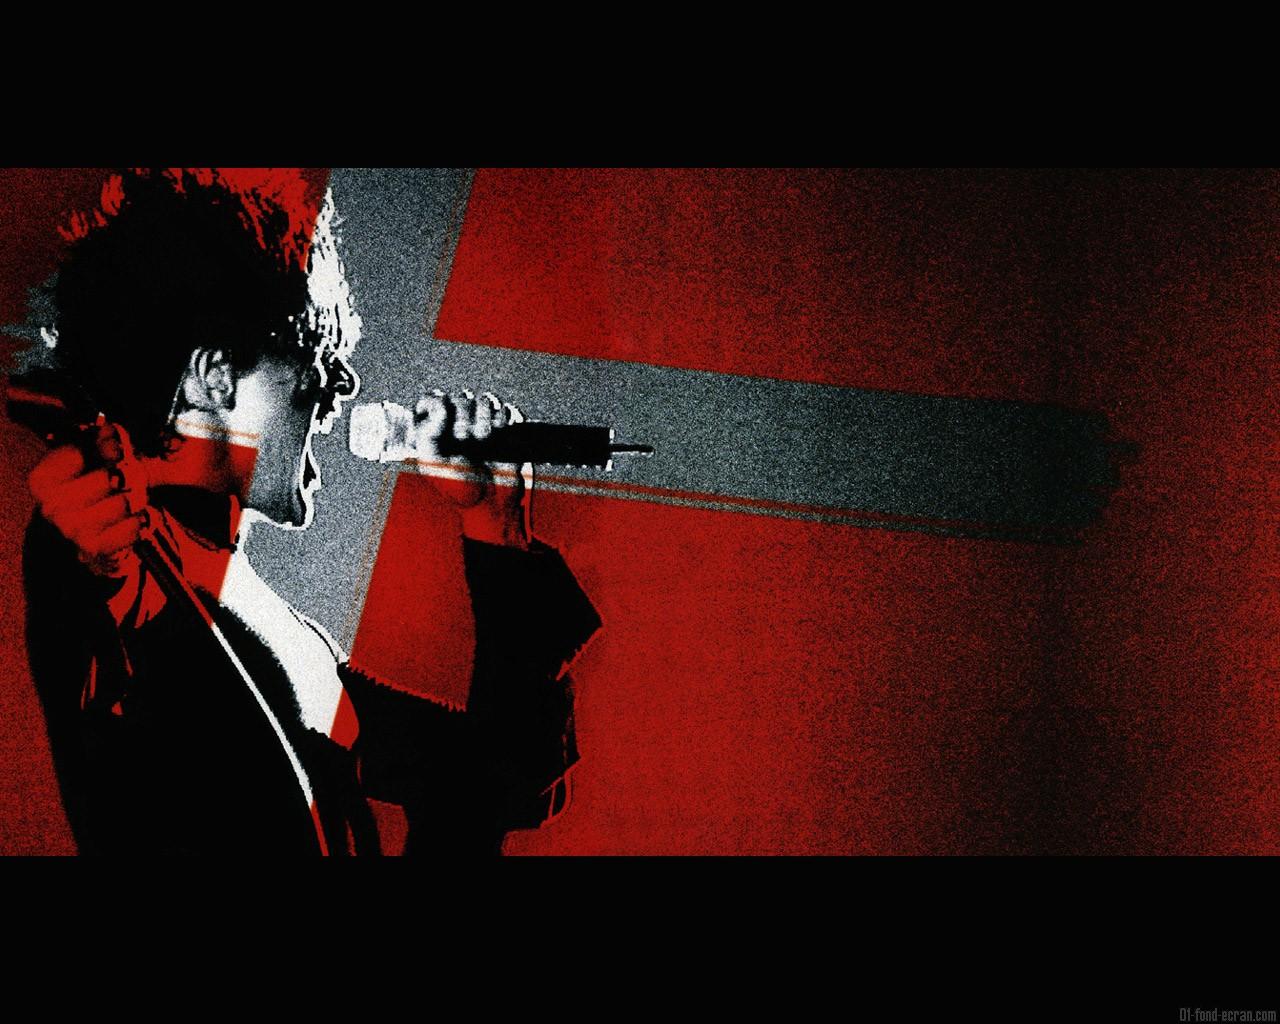 Indochine et ns nicola sirkis wallpaper 29392828 fanpop - Photos wallpaper ...